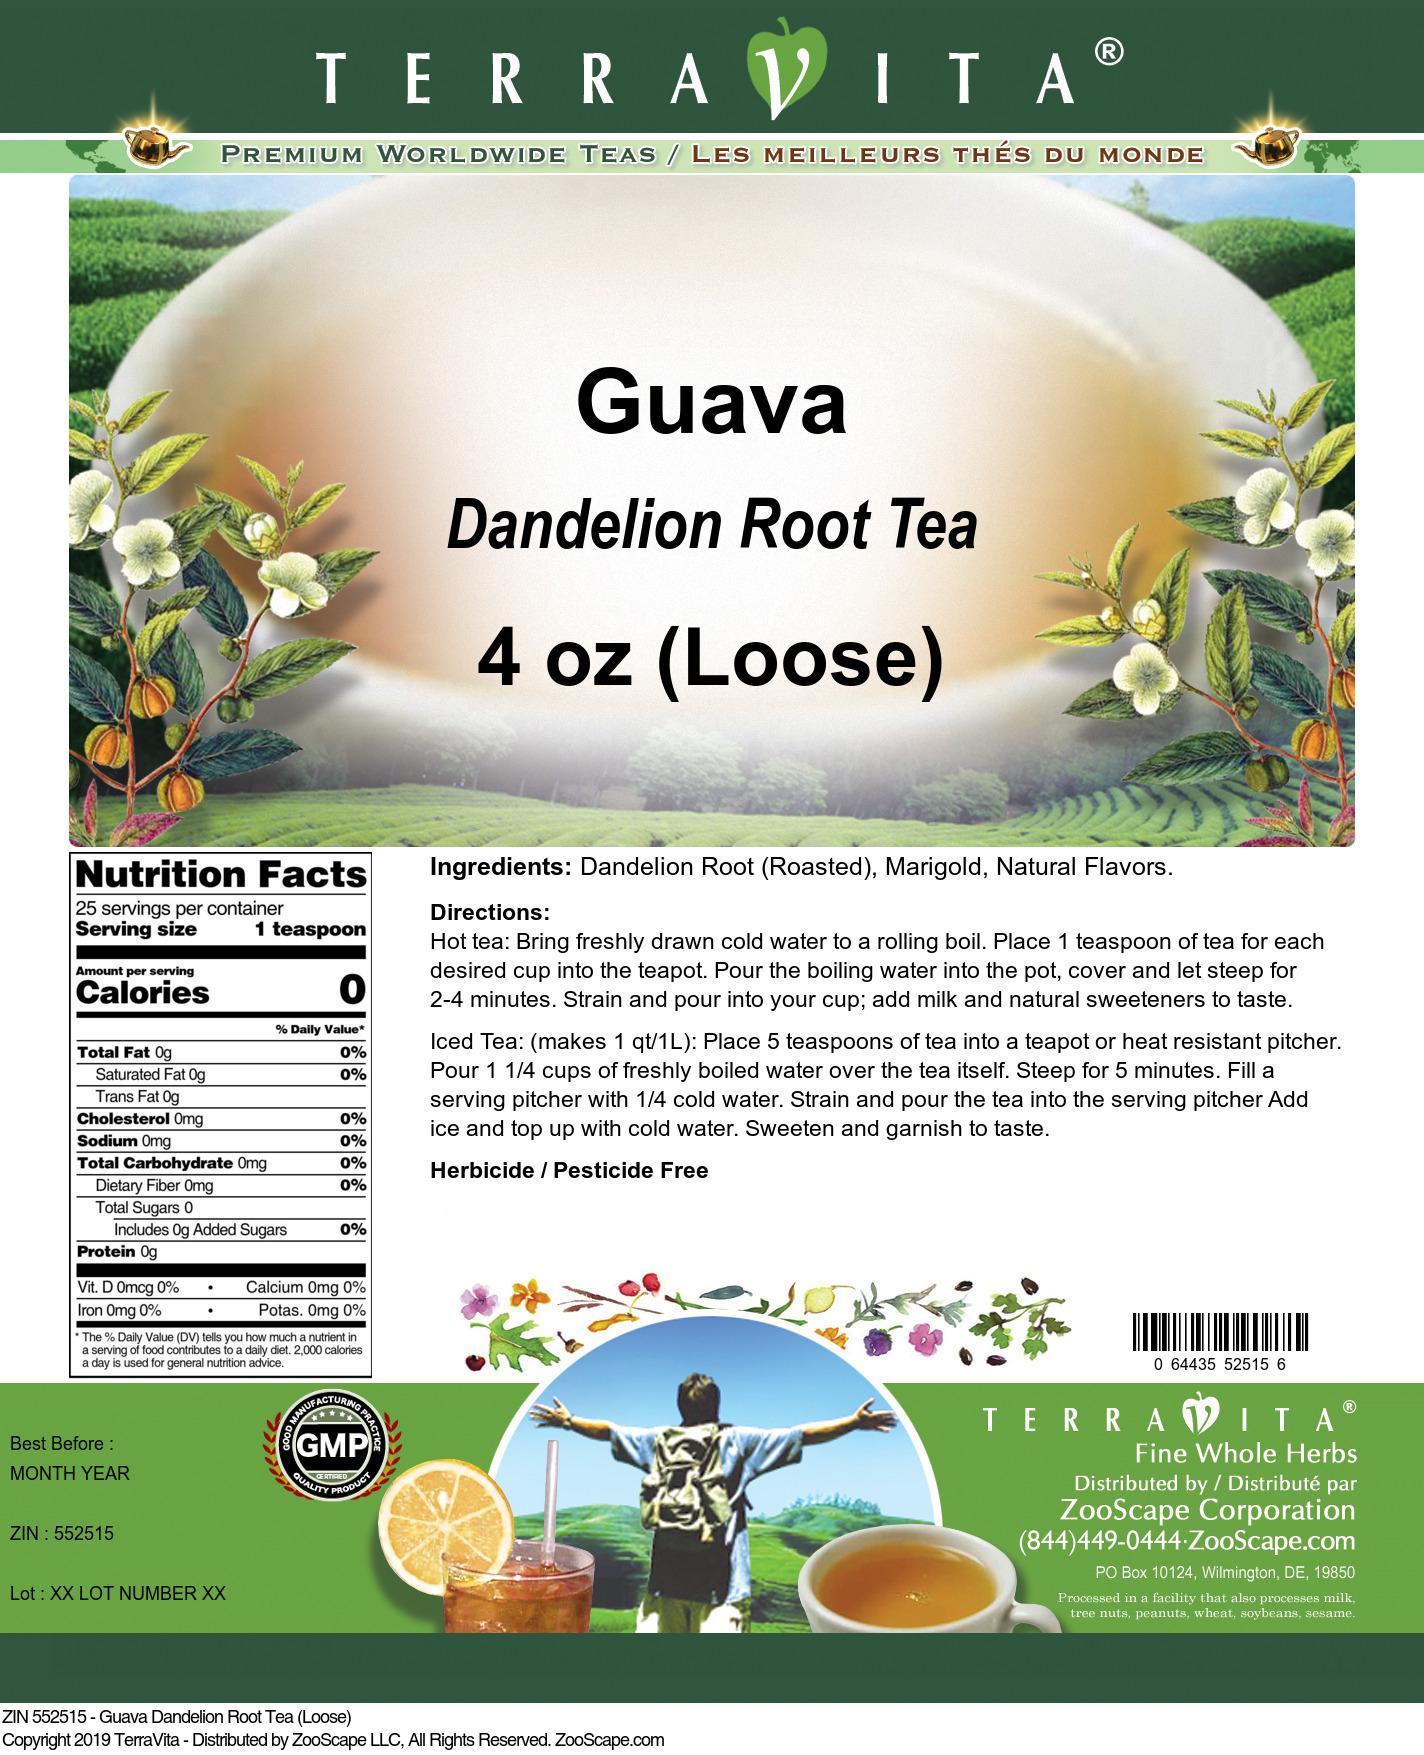 Guava Dandelion Root